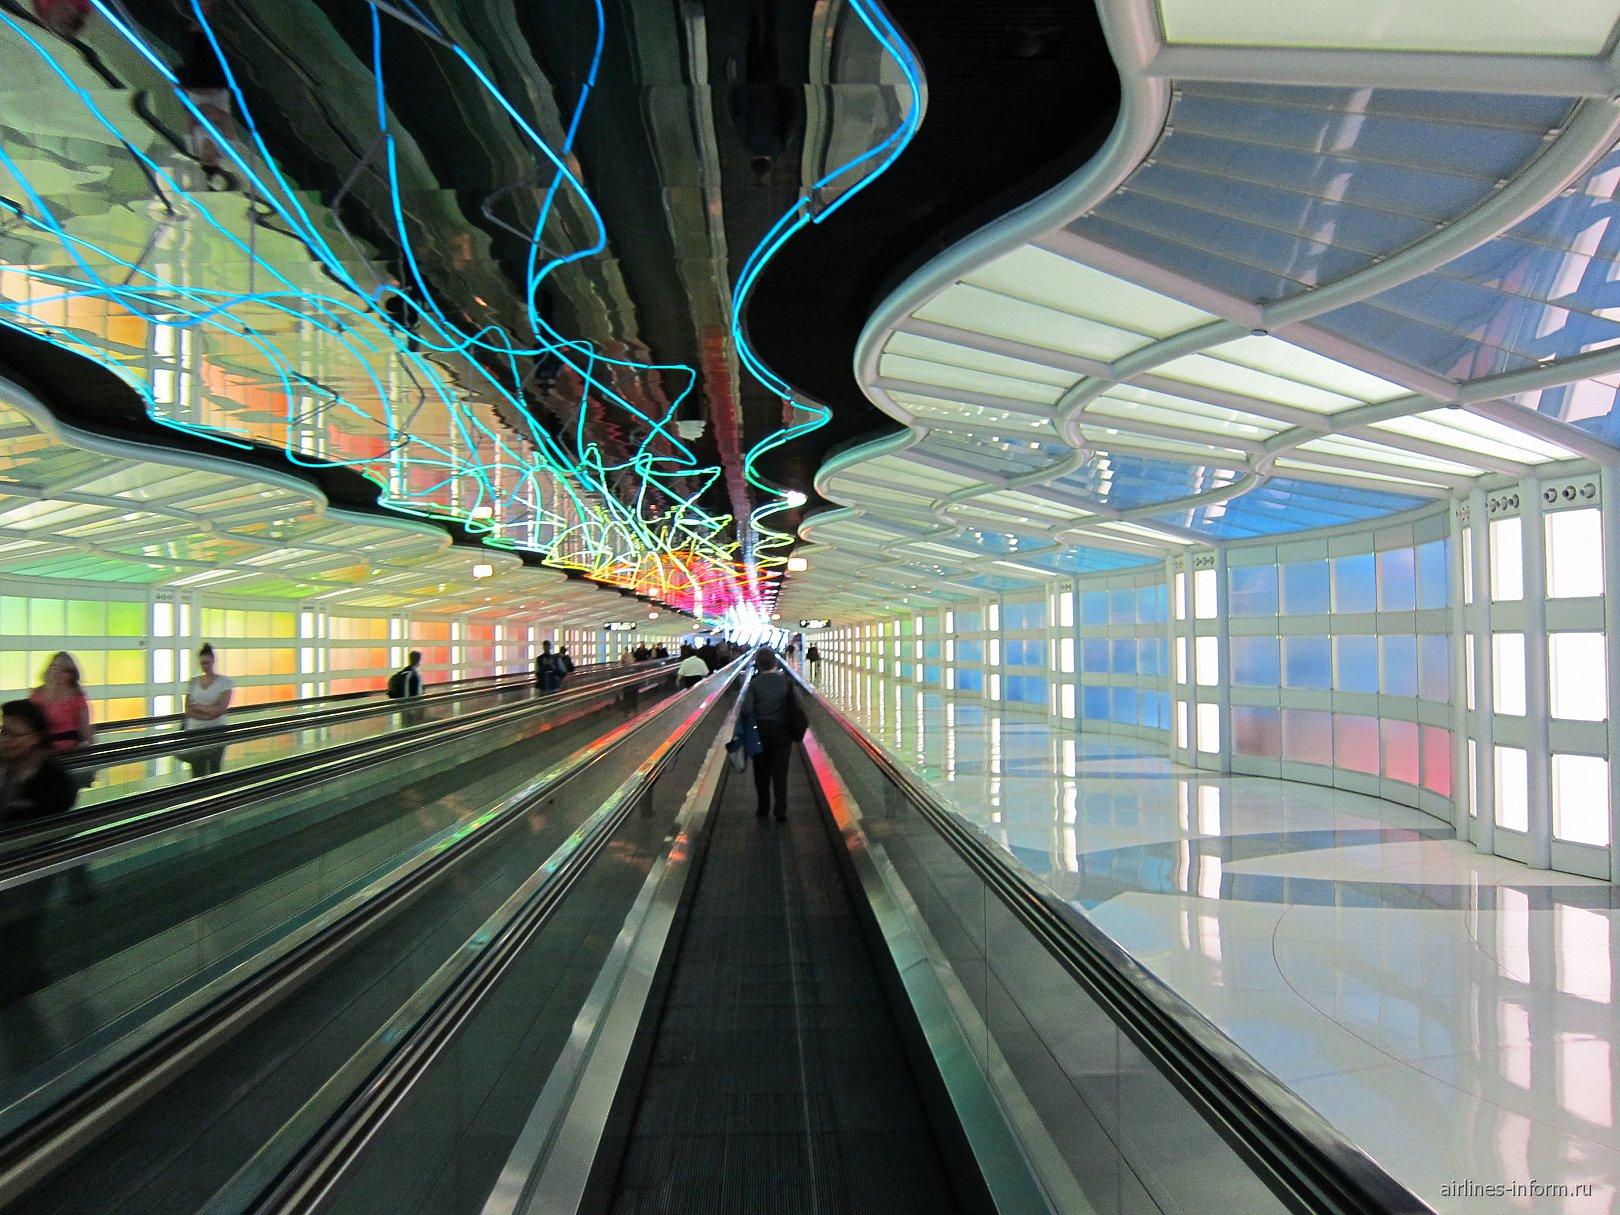 Переход в зоне прилета в аэропорту Чикаго О'Хара